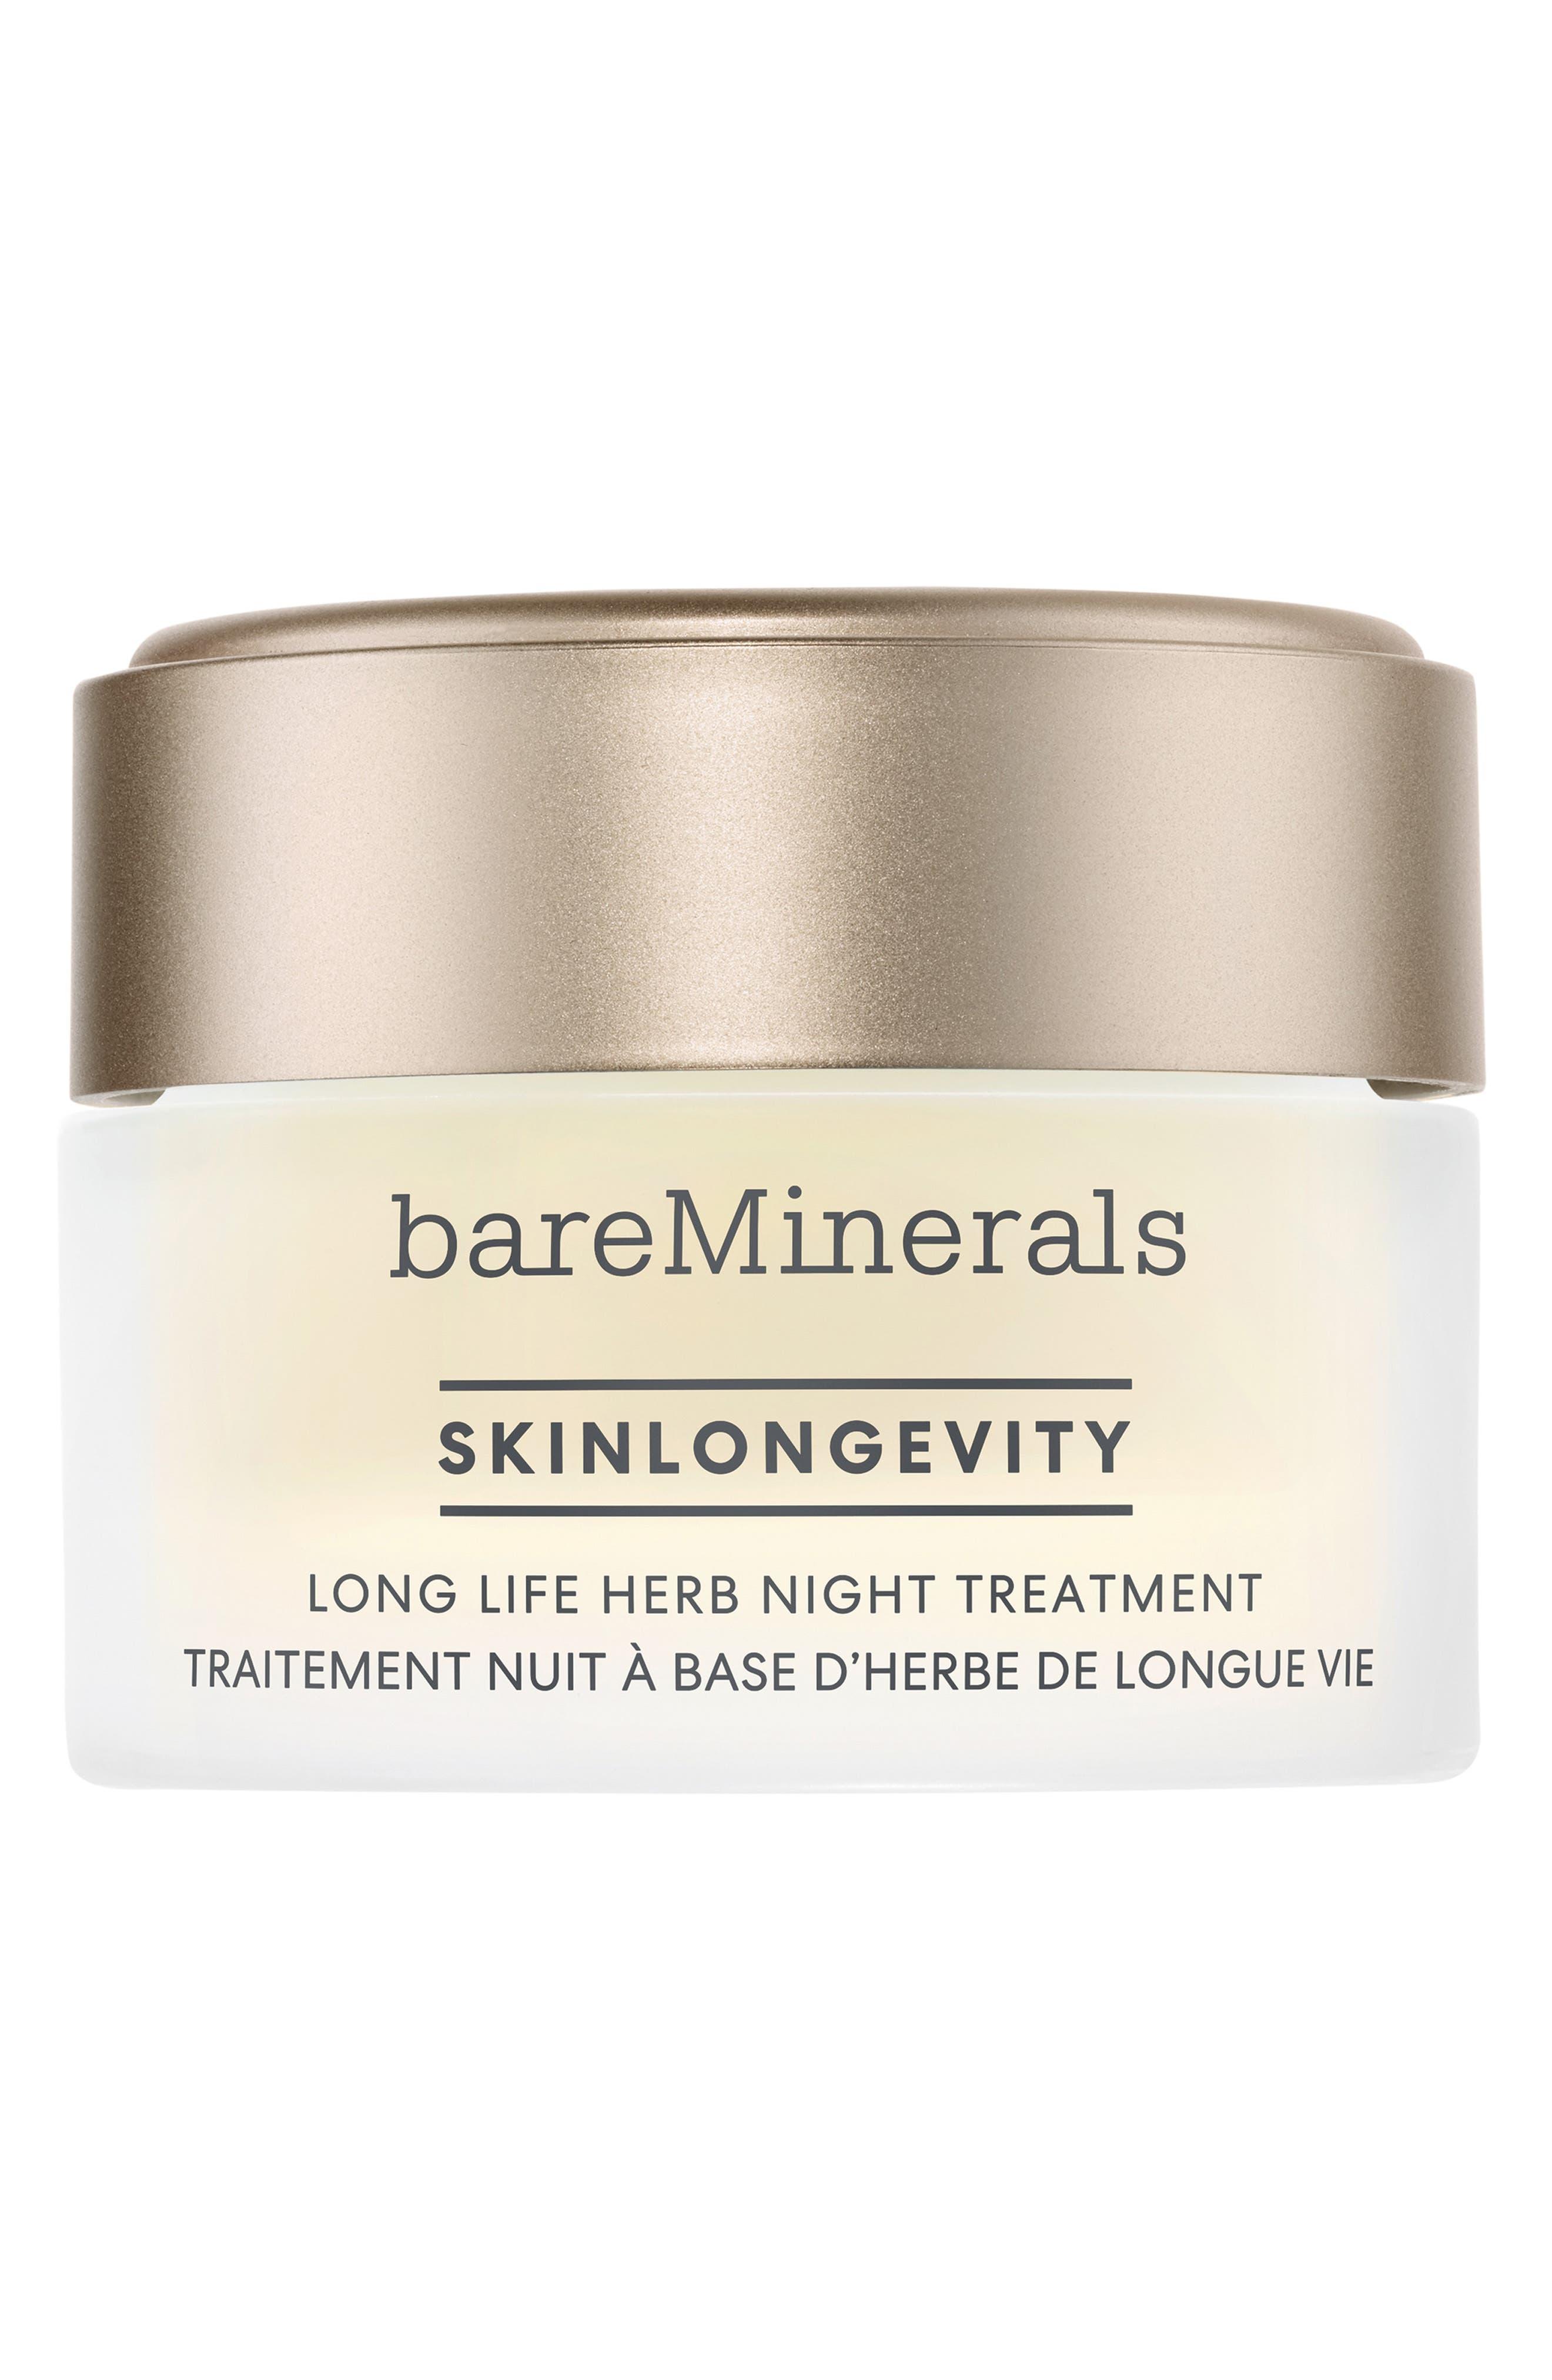 Bareminerals Skinlongevity Long Life Herb Anti-Aging Night Treatment